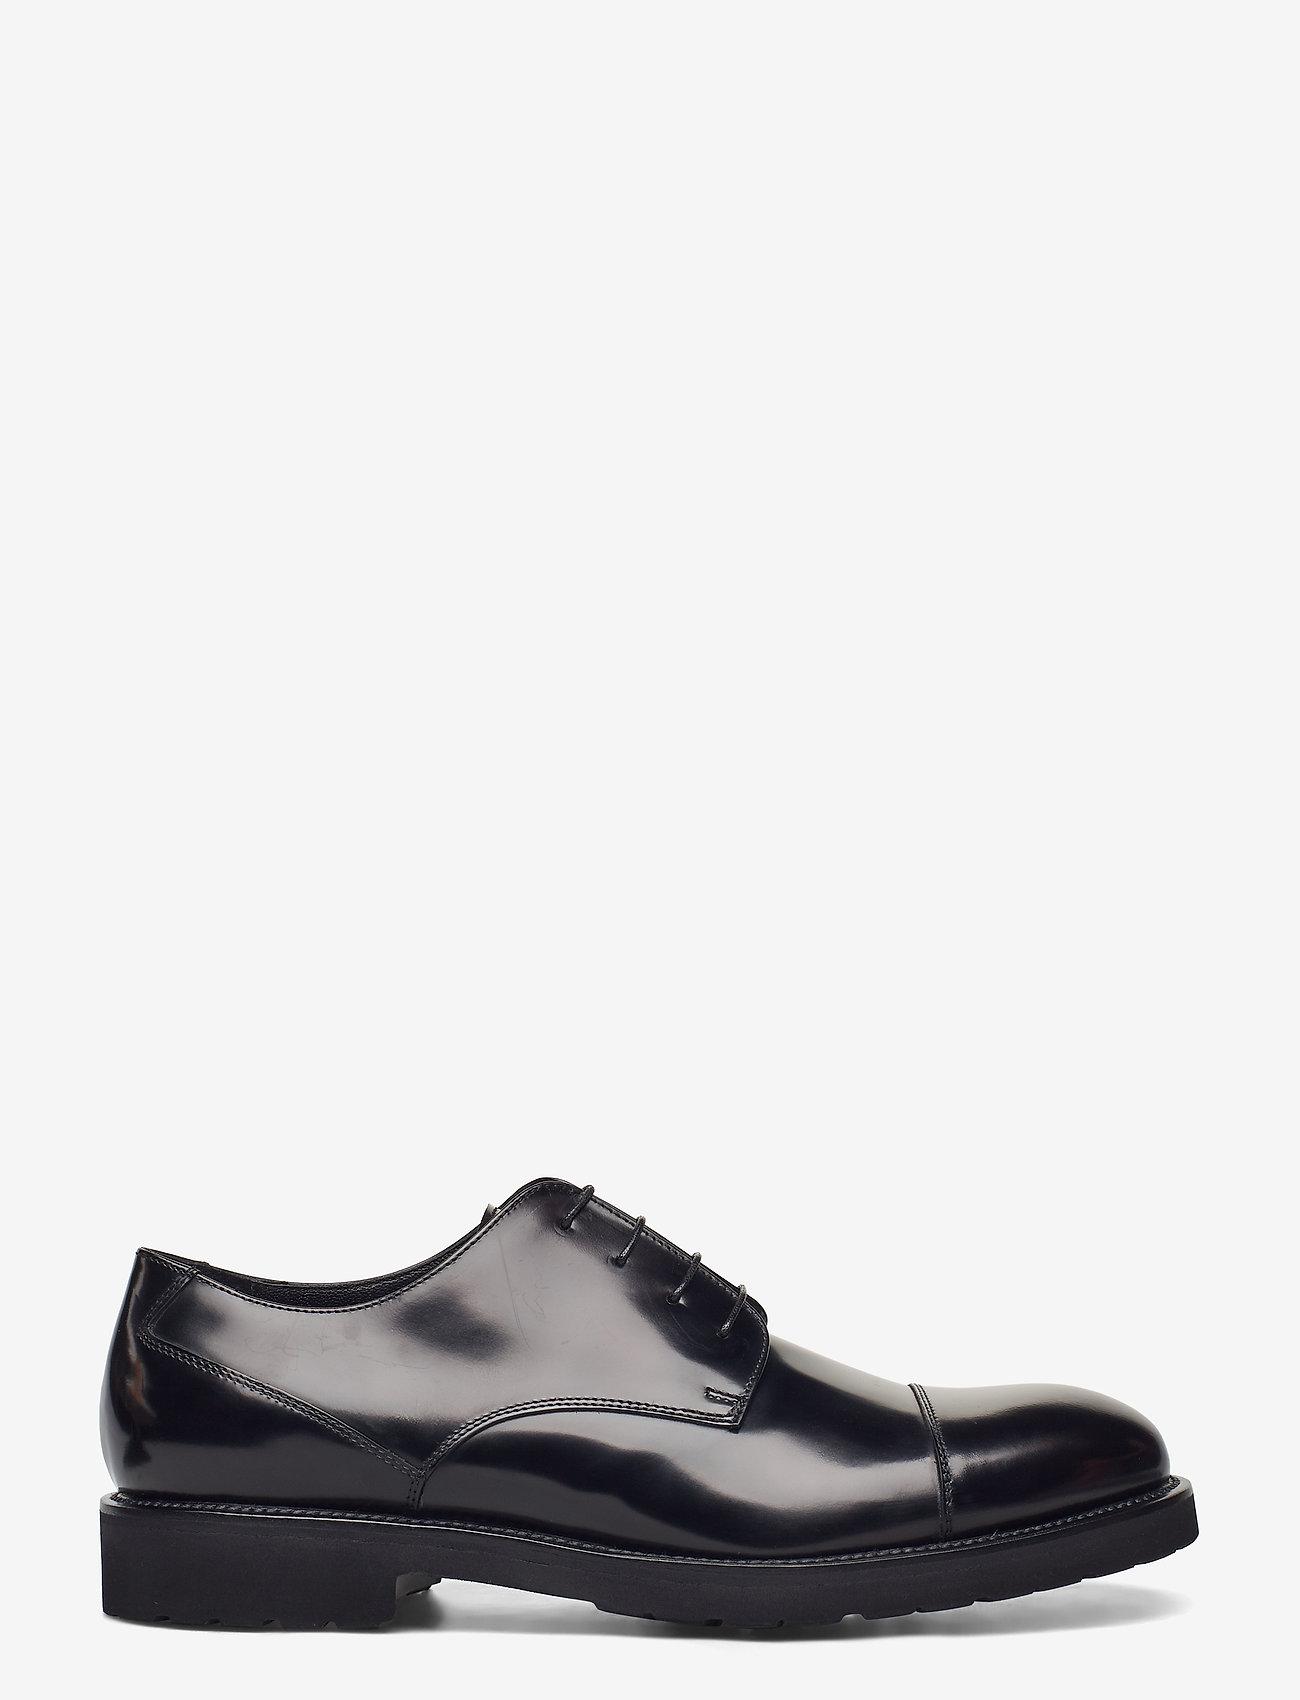 SAND - Footwear MW - F319 - nauhakengät - black - 1